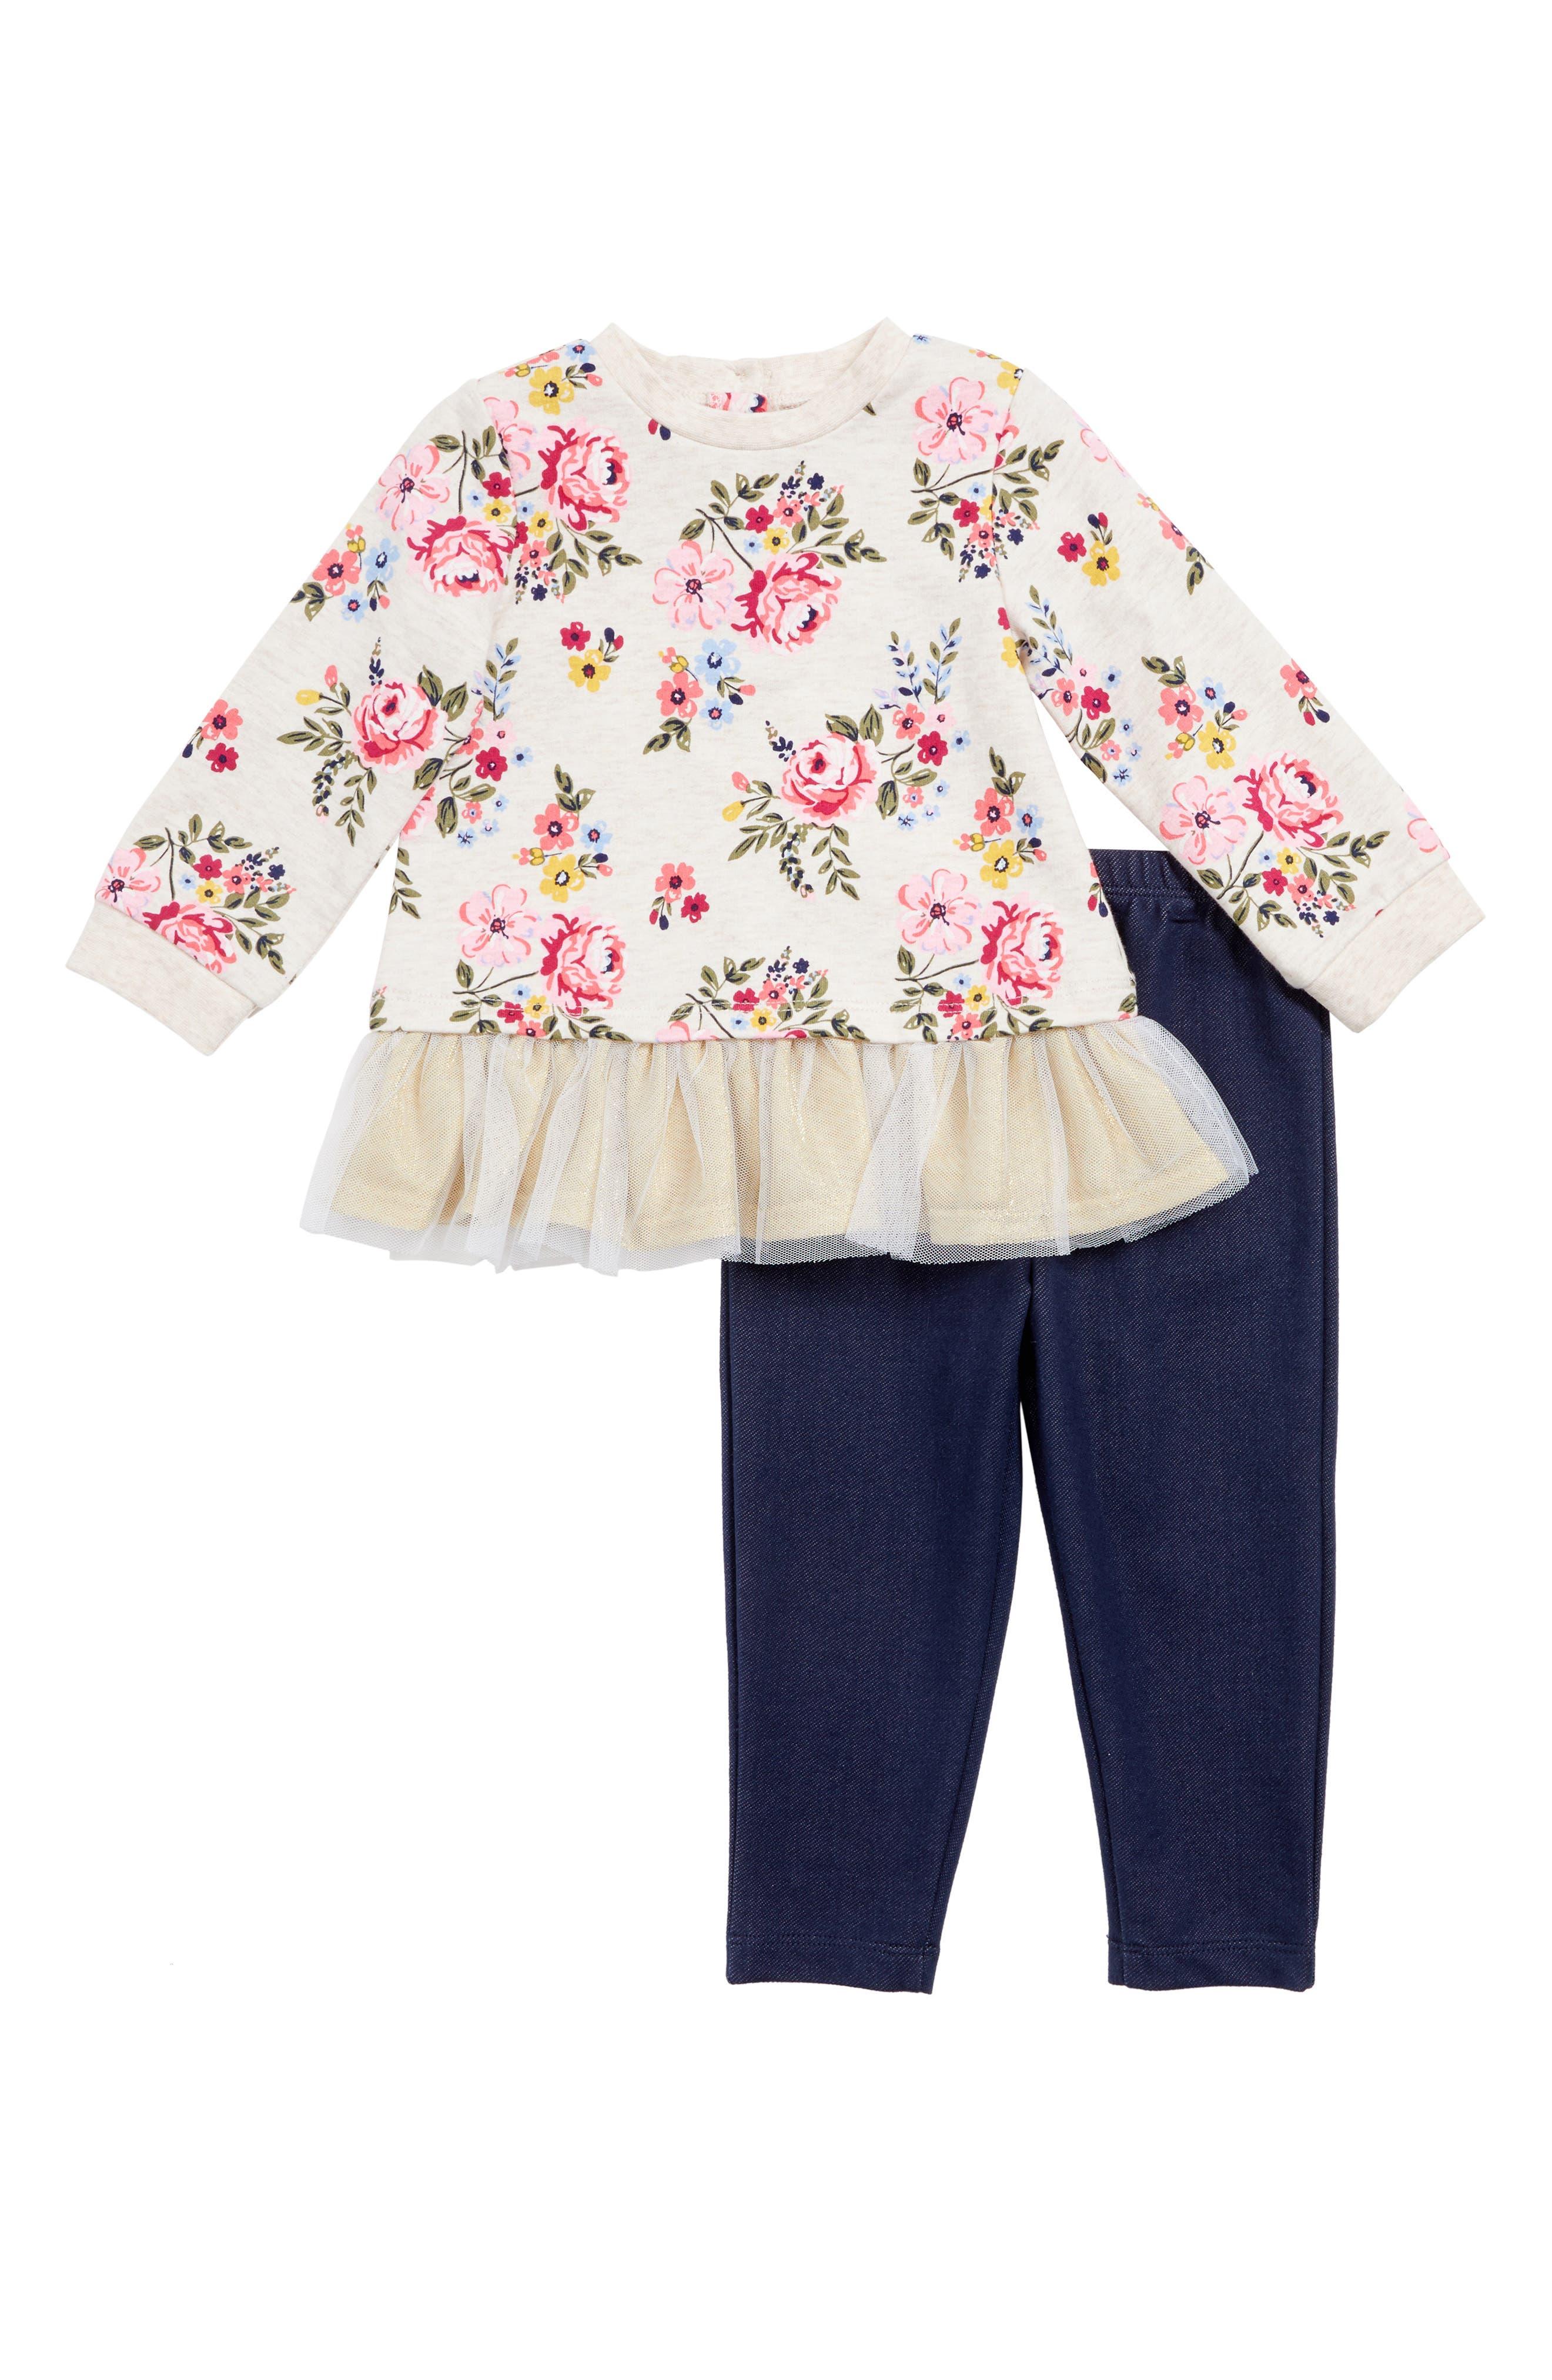 Main Image - Little Me Floral Top & Leggings Set (Baby Girls)